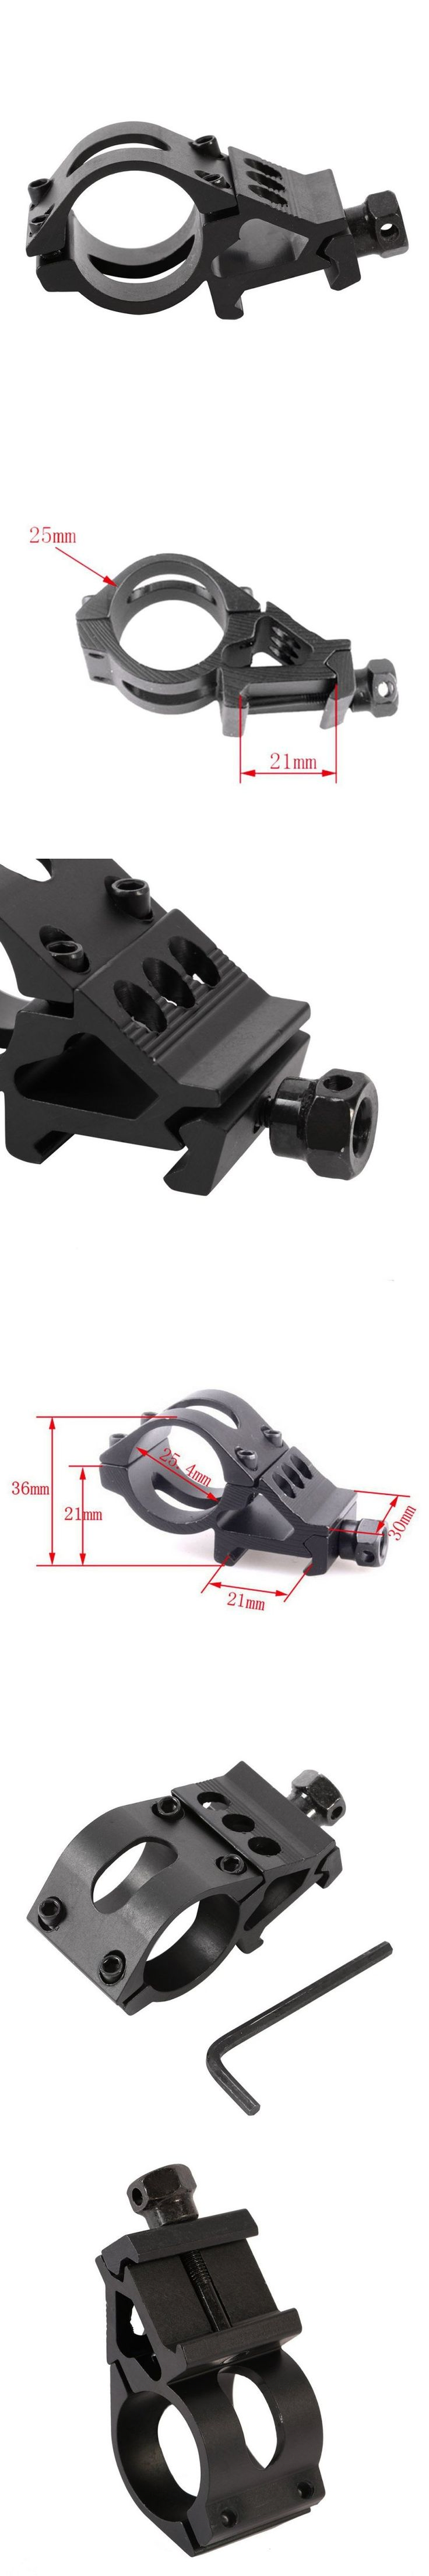 25mm Ring Tactical Scope Sight Flashlight Torch Laser Mounts + Allen Key for 20mm Standard Picatinny/Weaver Rail Hot Selling